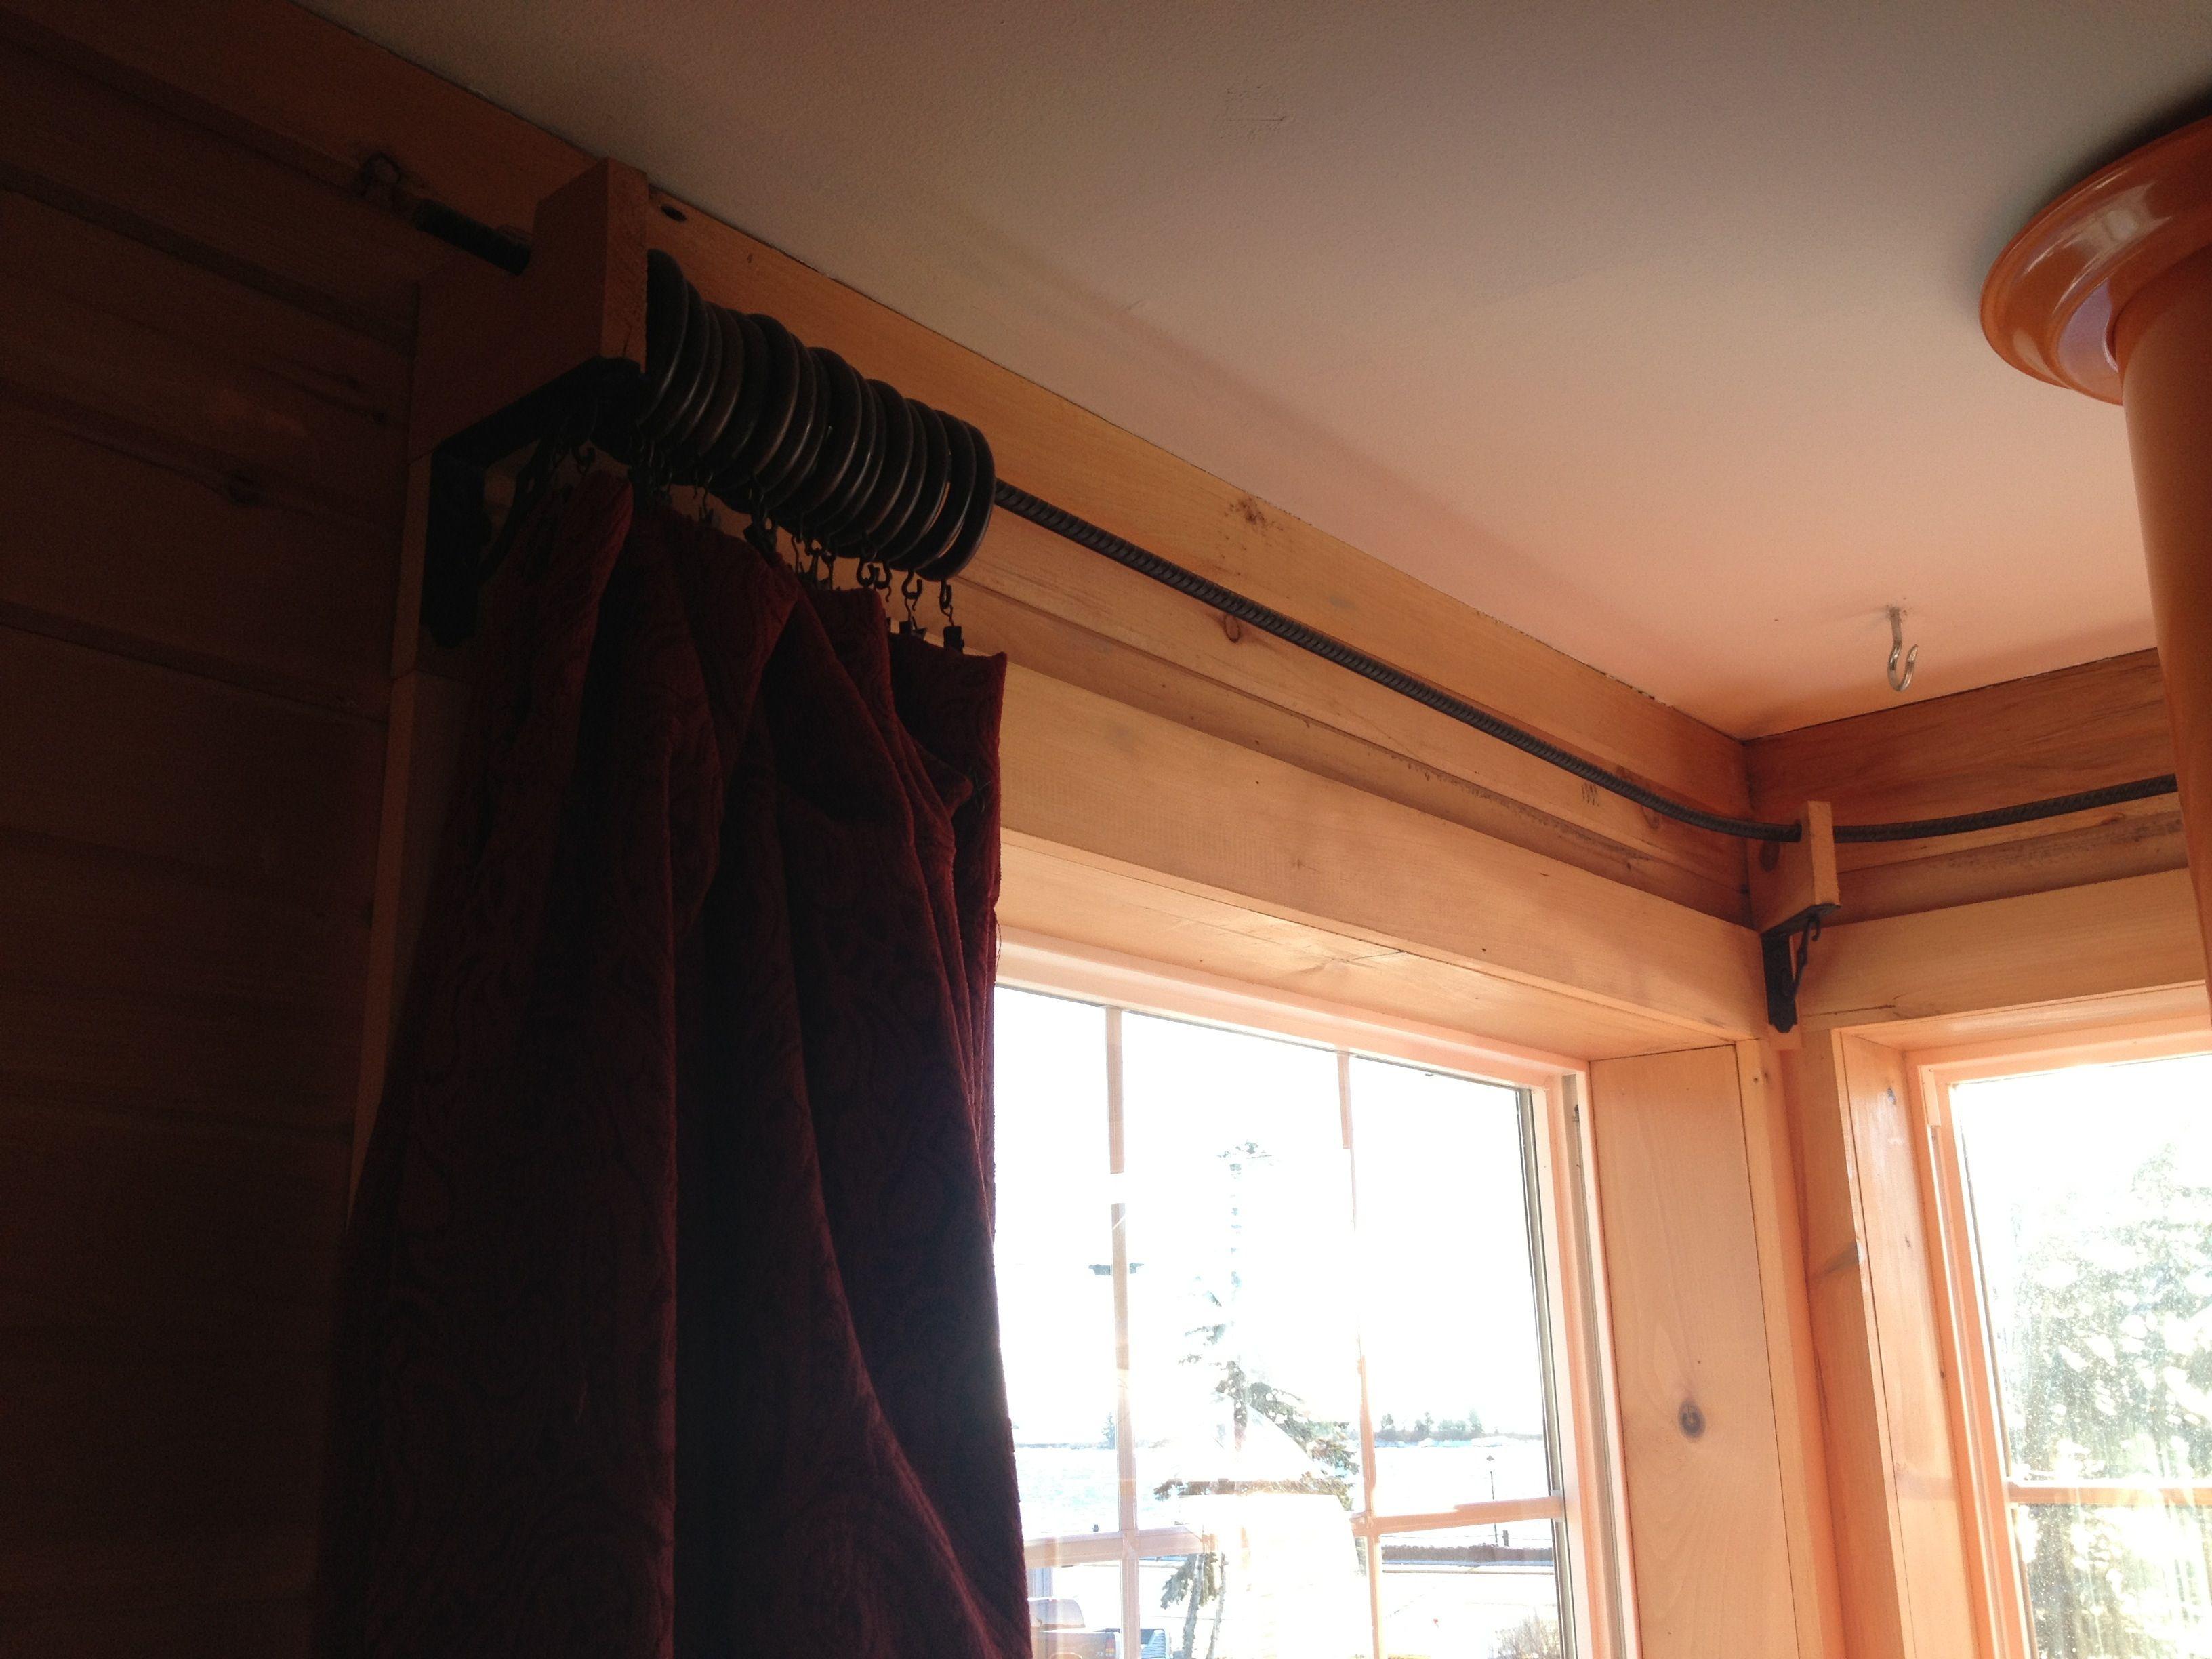 Bent Rebar As Curtain Rod Curtains Home Curtain Rods